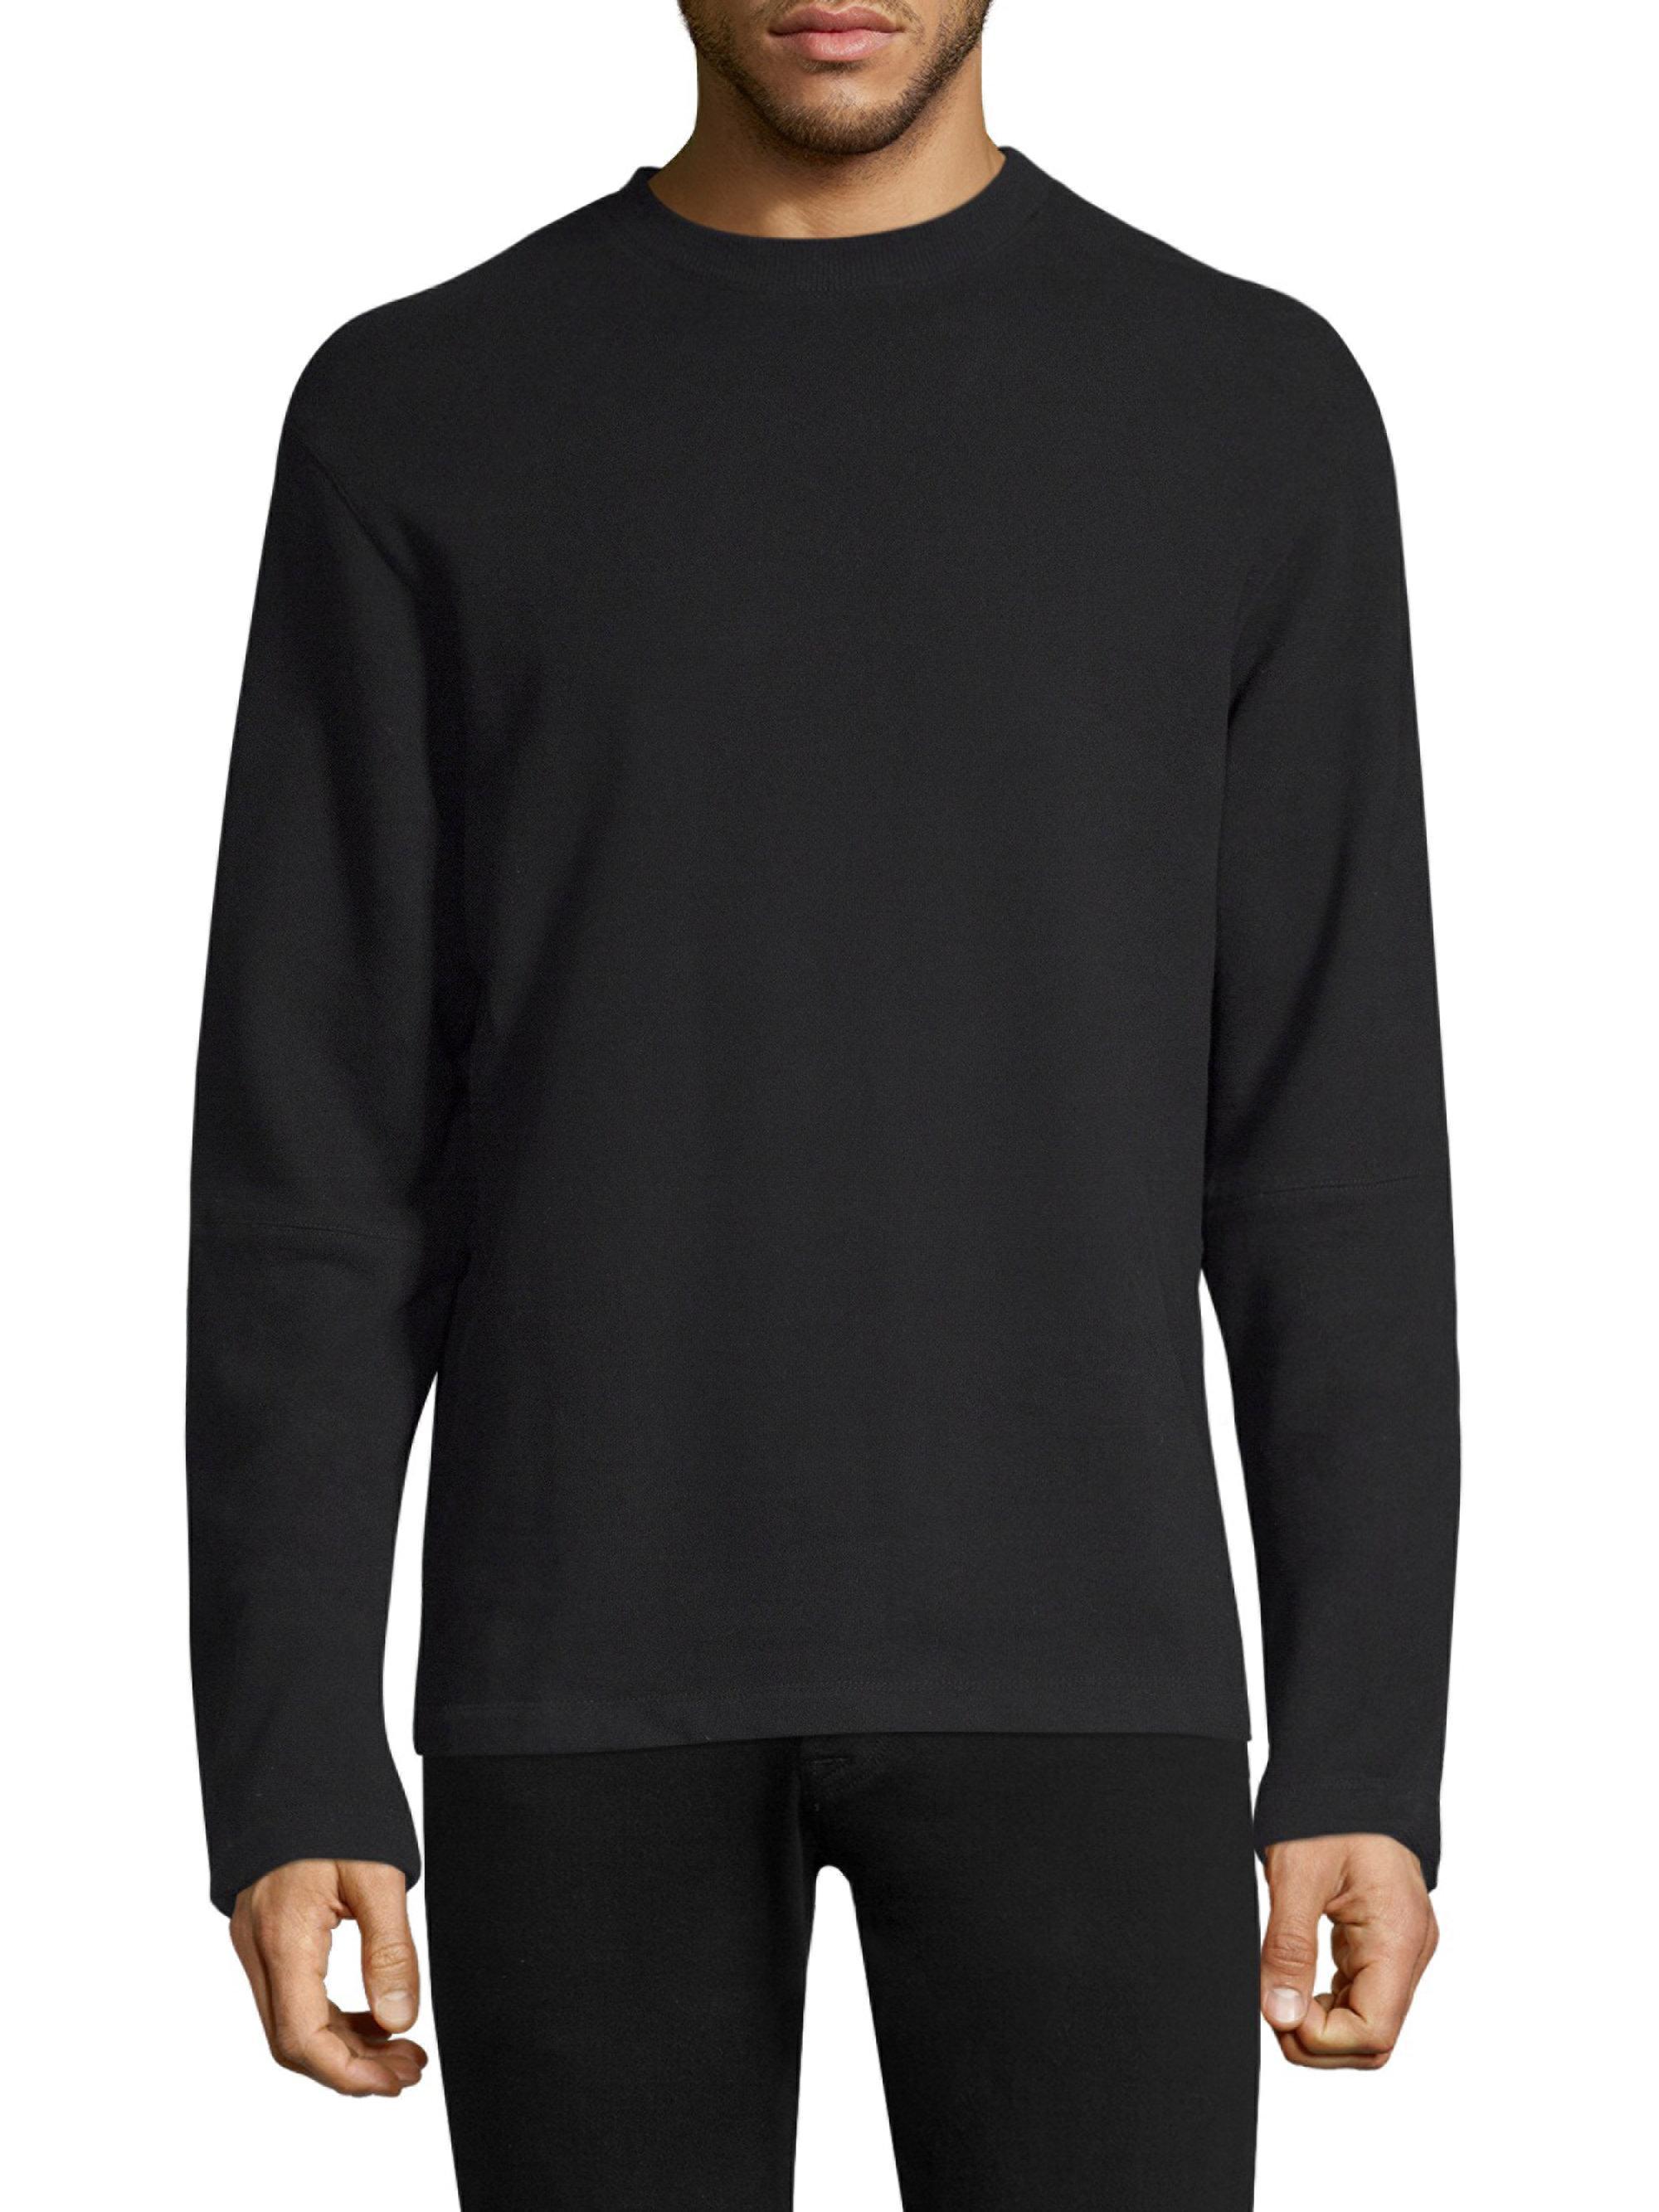 ribbed detail sweatshirt - Black Helmut Lang Outlet Pictures Cheap Discount View Sale Online G2lTKGA1r